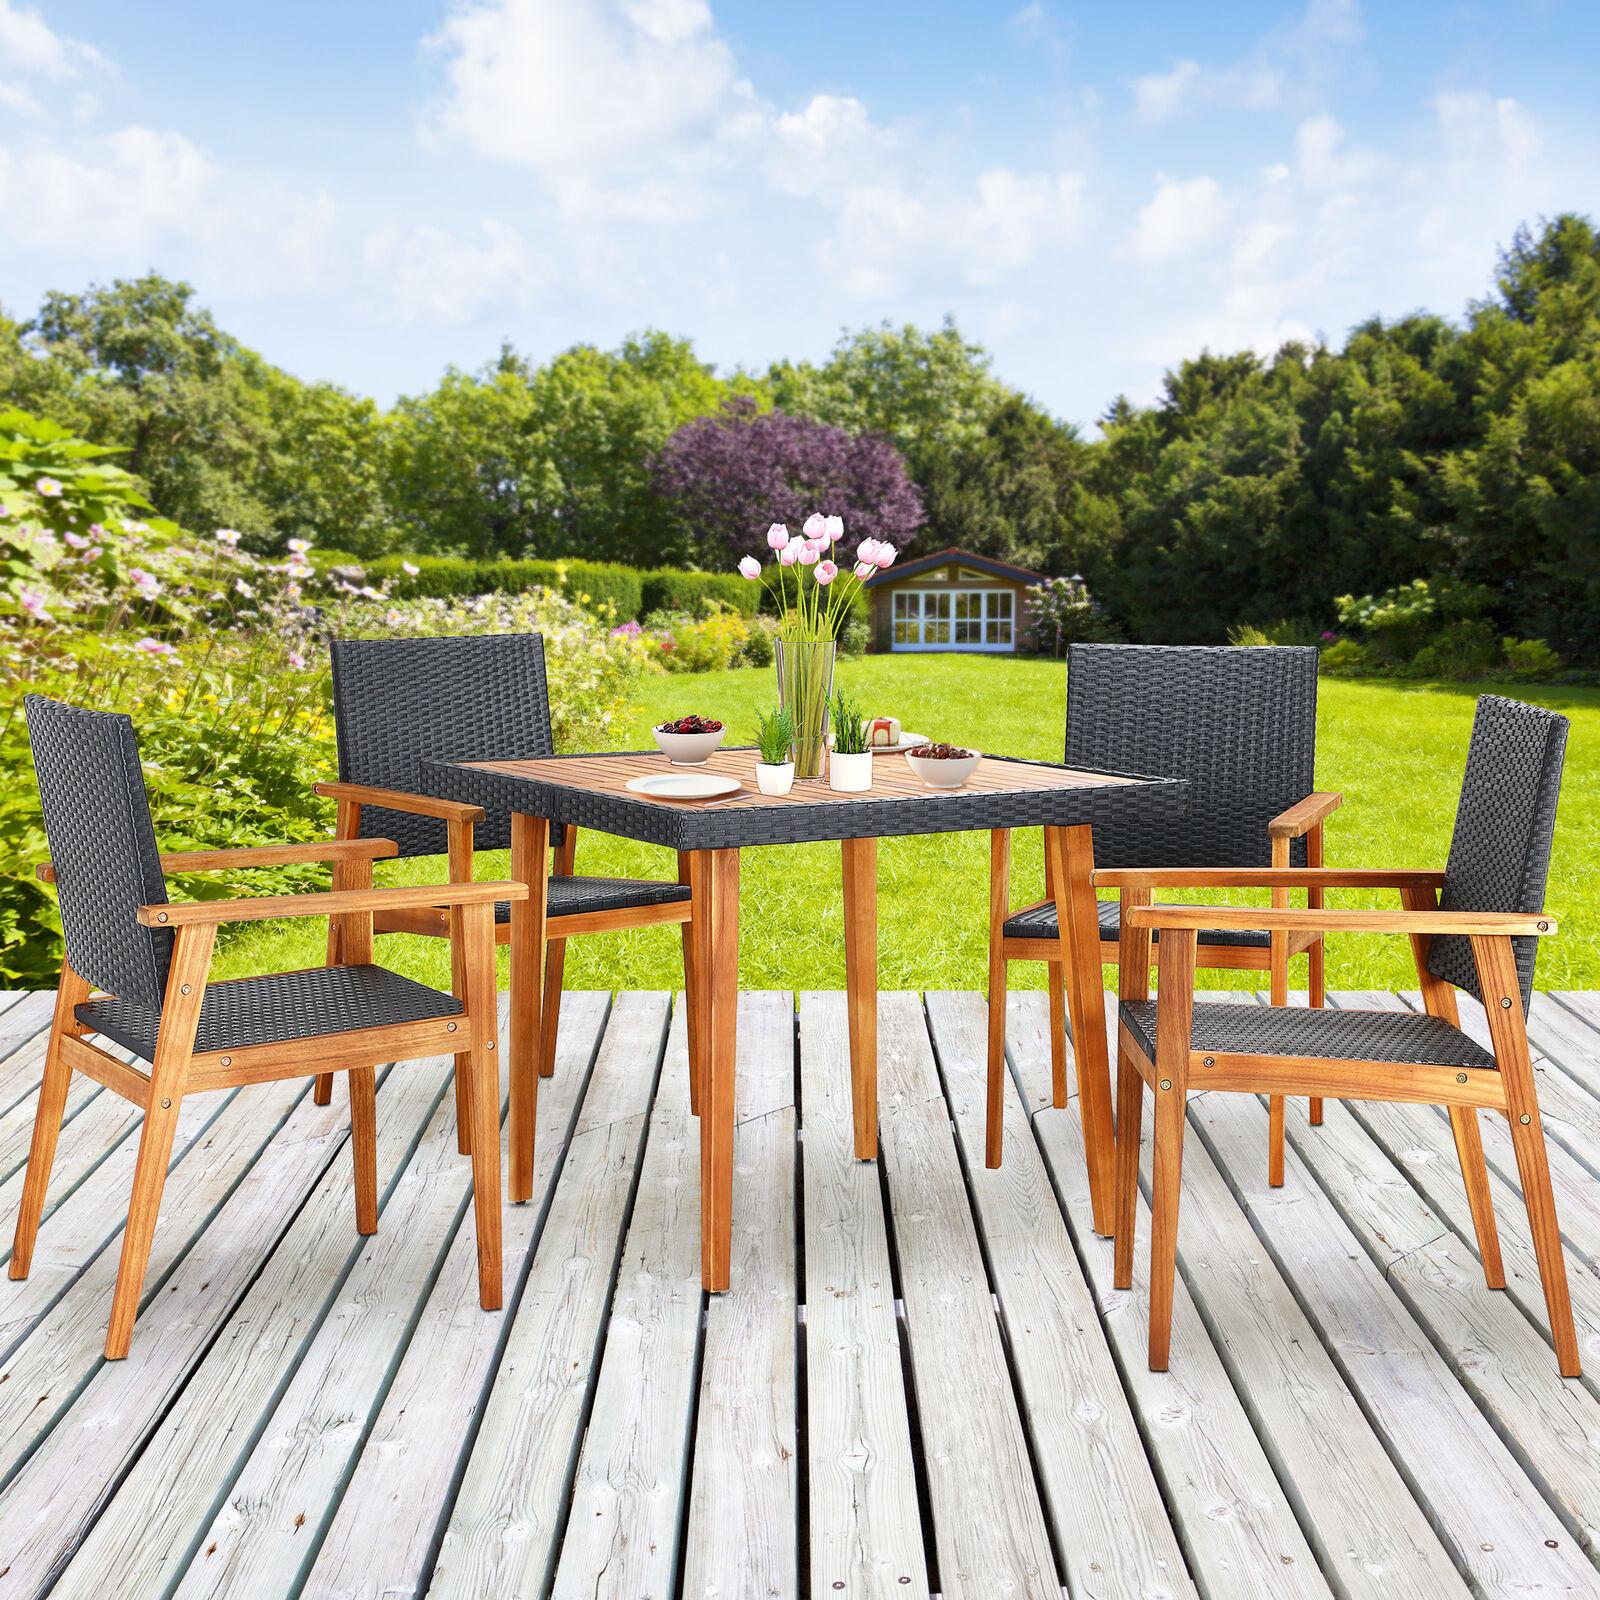 B-WARE Poly Rattan Sitzgruppe Gartenmöbel Set Balkonset Akazie Holz Garten 5 tlg